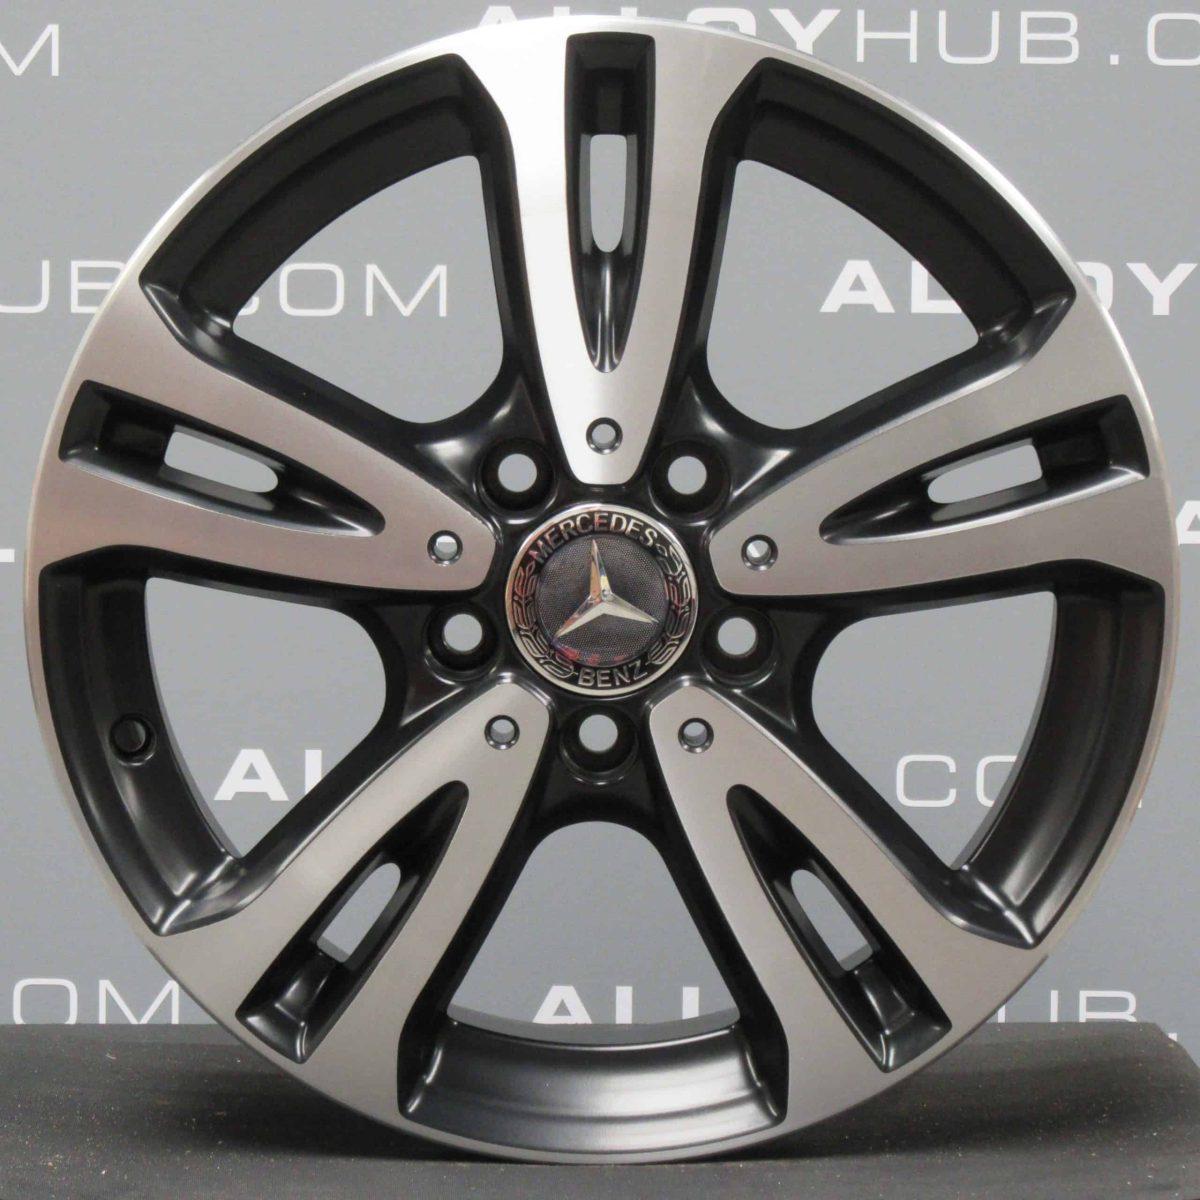 "Genuine Mercedes-Benz CLA C117 16"" inch 5 Twin Spoke Alloy Wheels with Black & Diamond Turned Finish A2464010000"